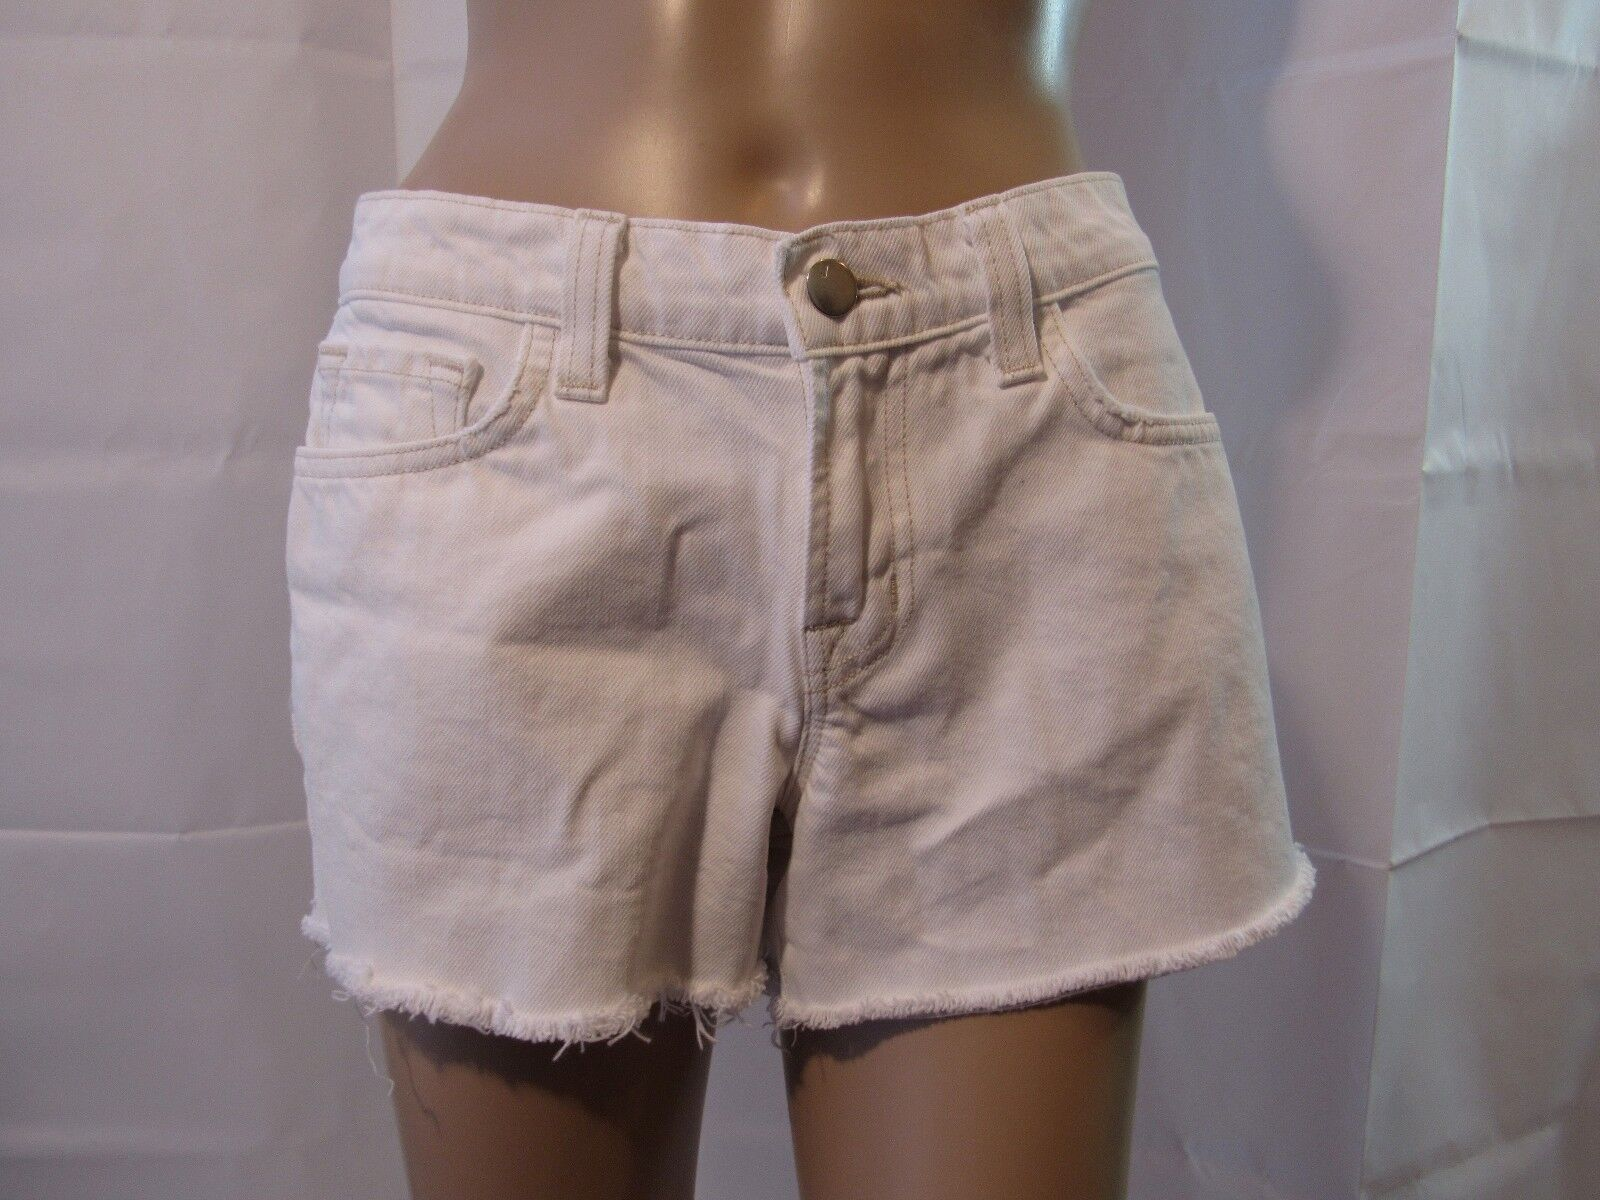 J Brand White Cut-Off Shorts Size 25